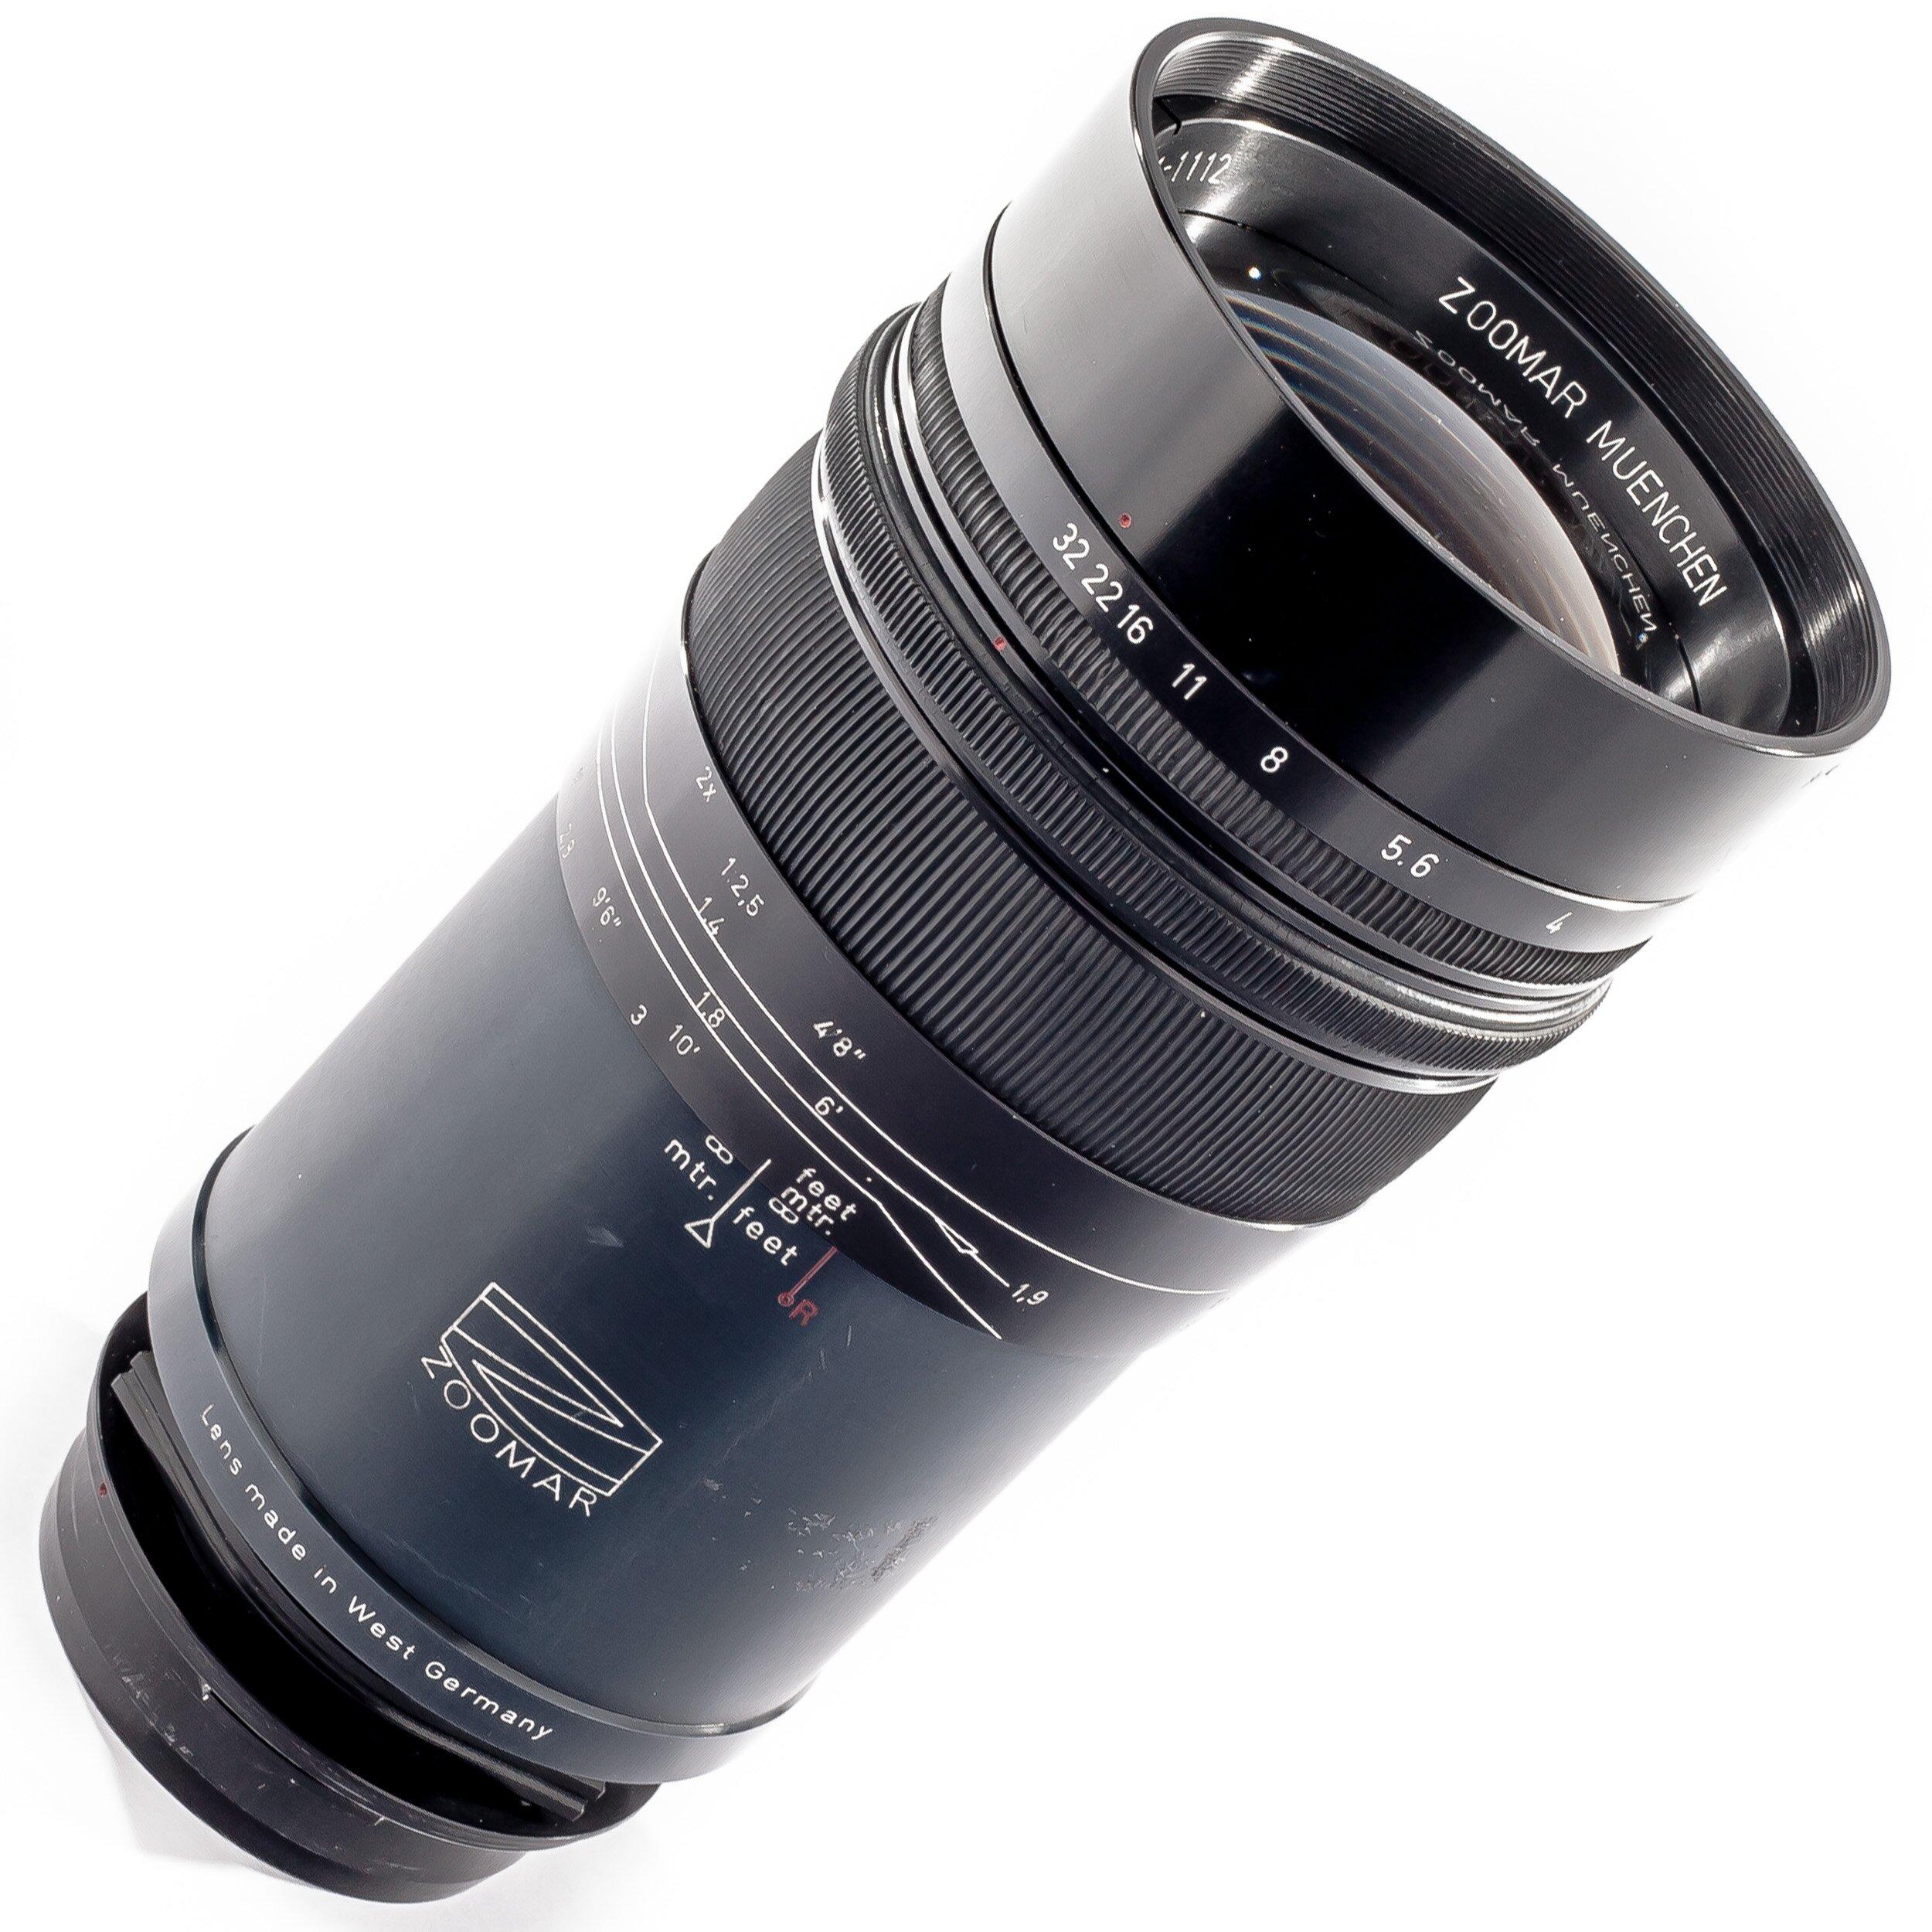 Zoomar 4/300mm Pan-Tele-Kilar Prototyp